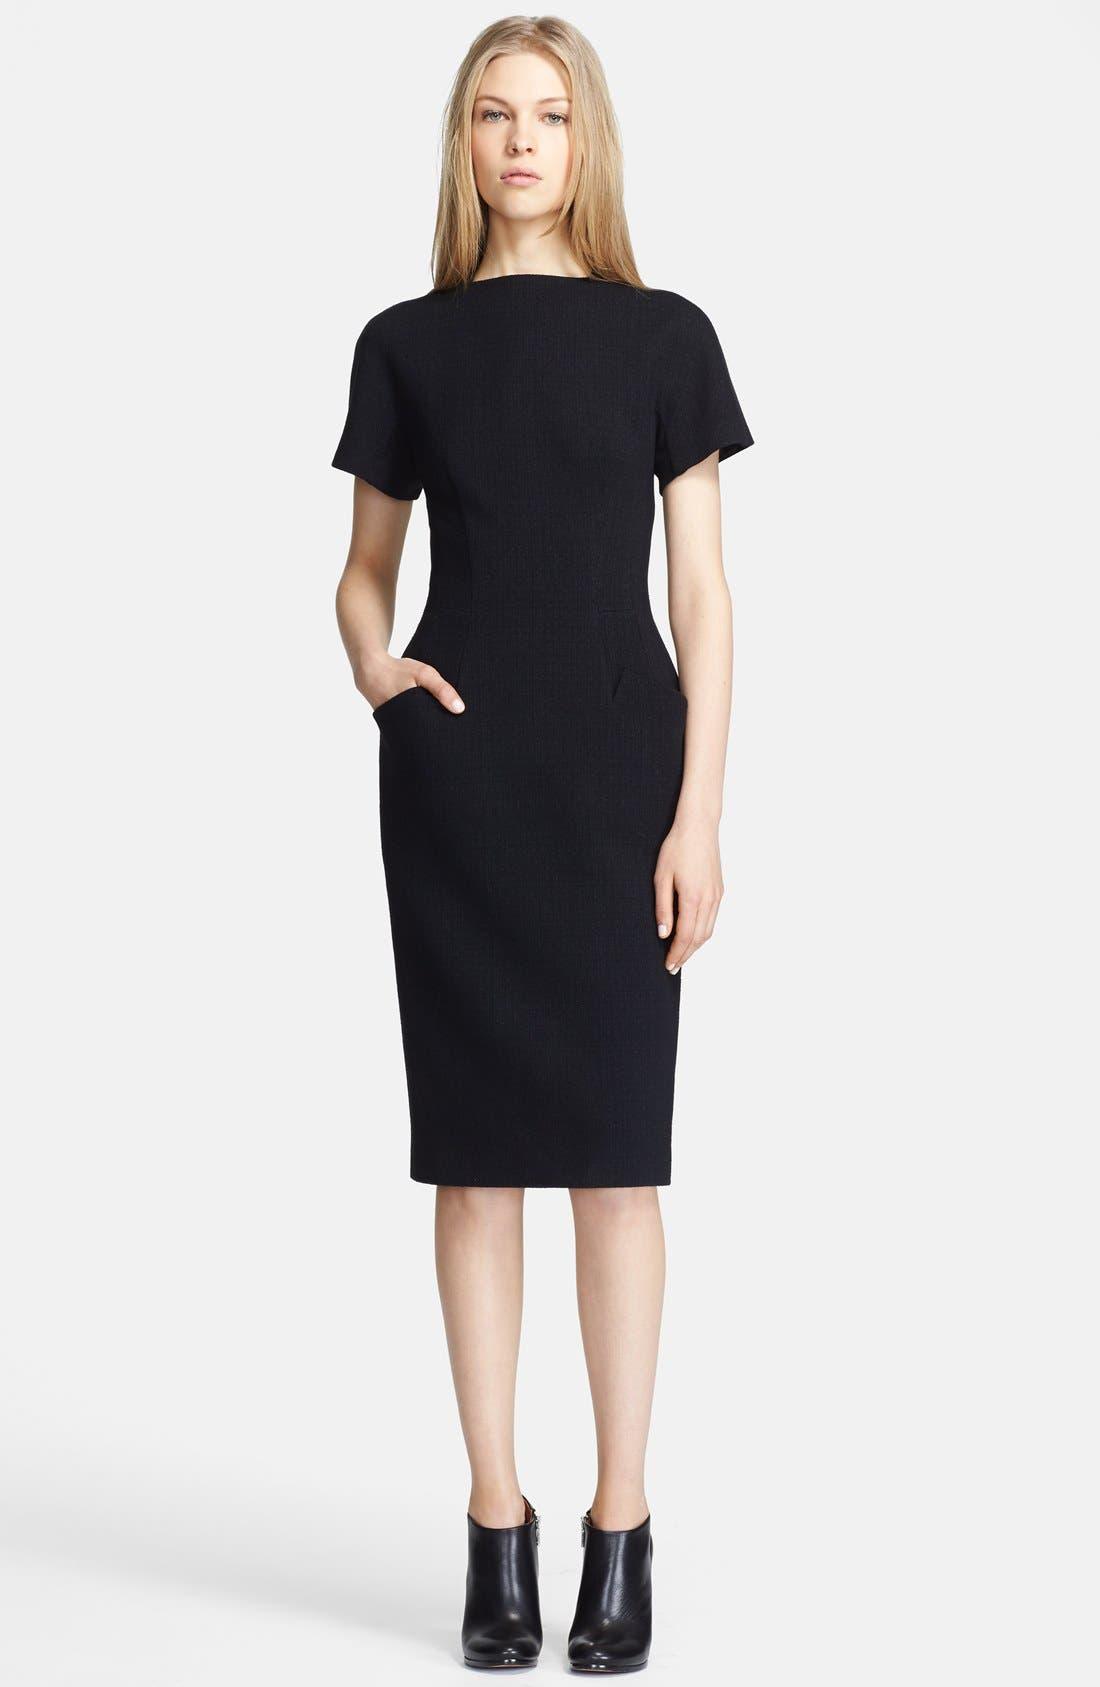 Alternate Image 1 Selected - Proenza Schouler Short Sleeve Jersey Dress